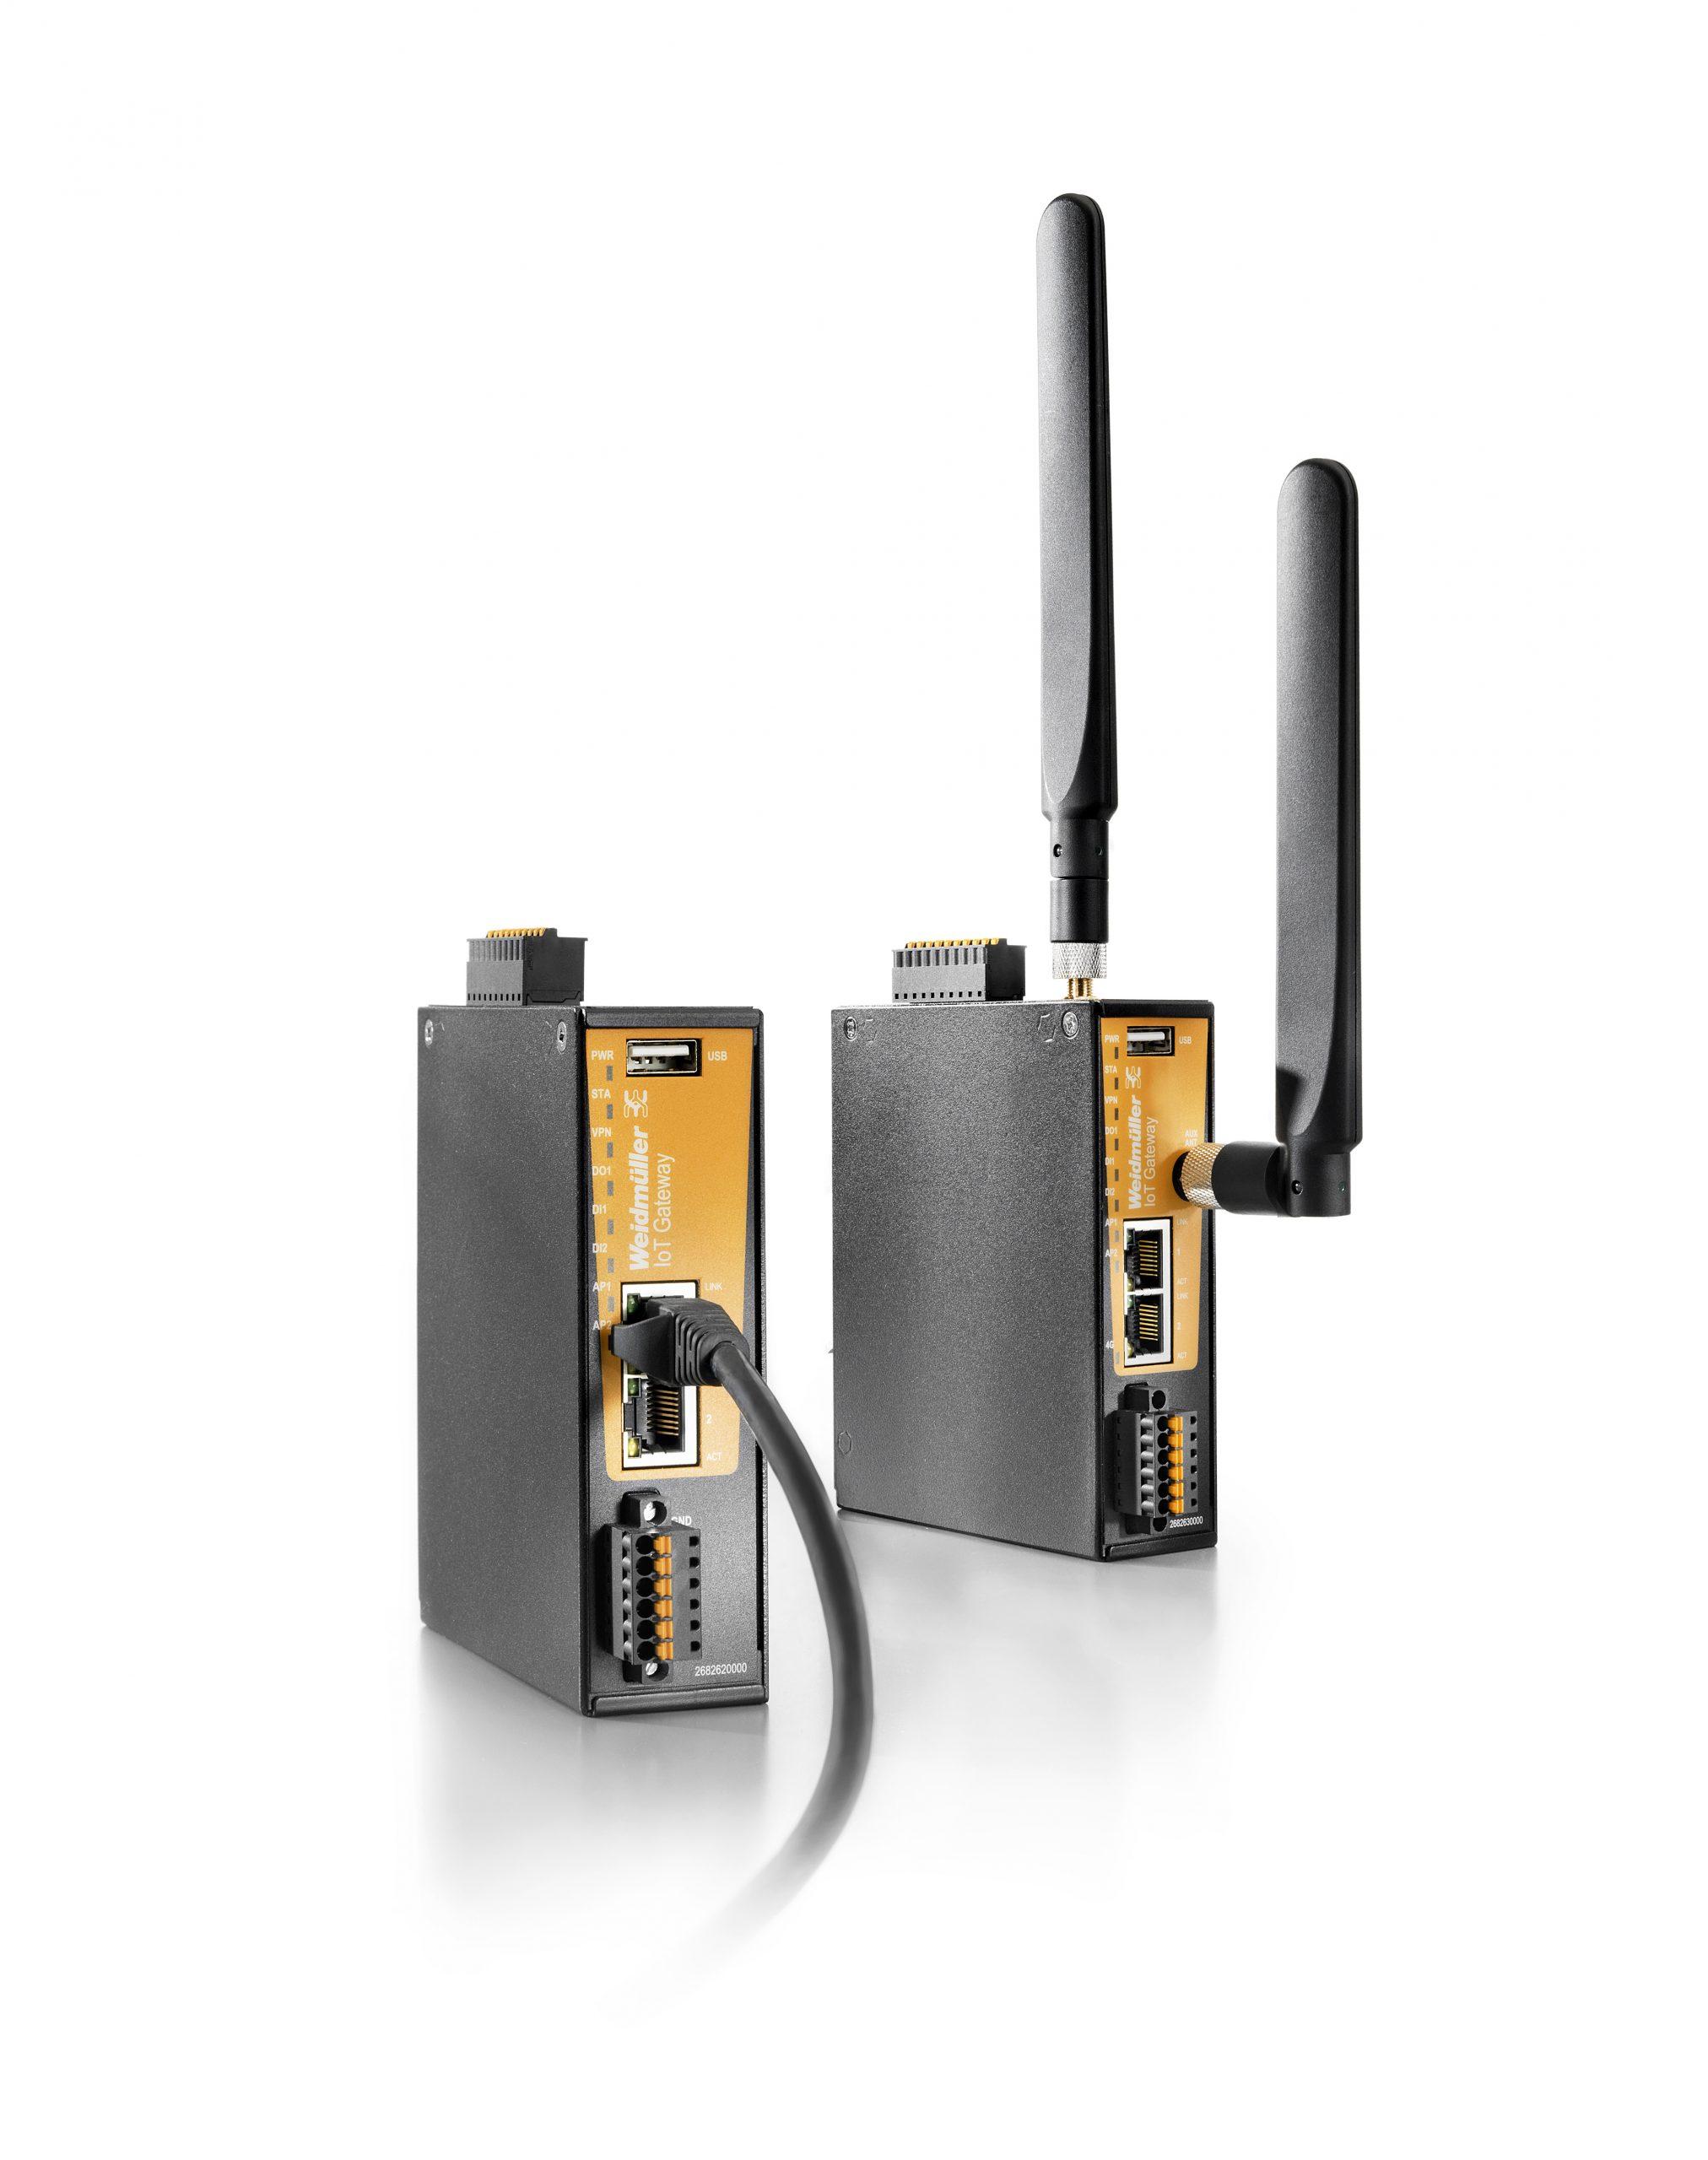 4G-LTE-fähiges Multifunktionsgateway